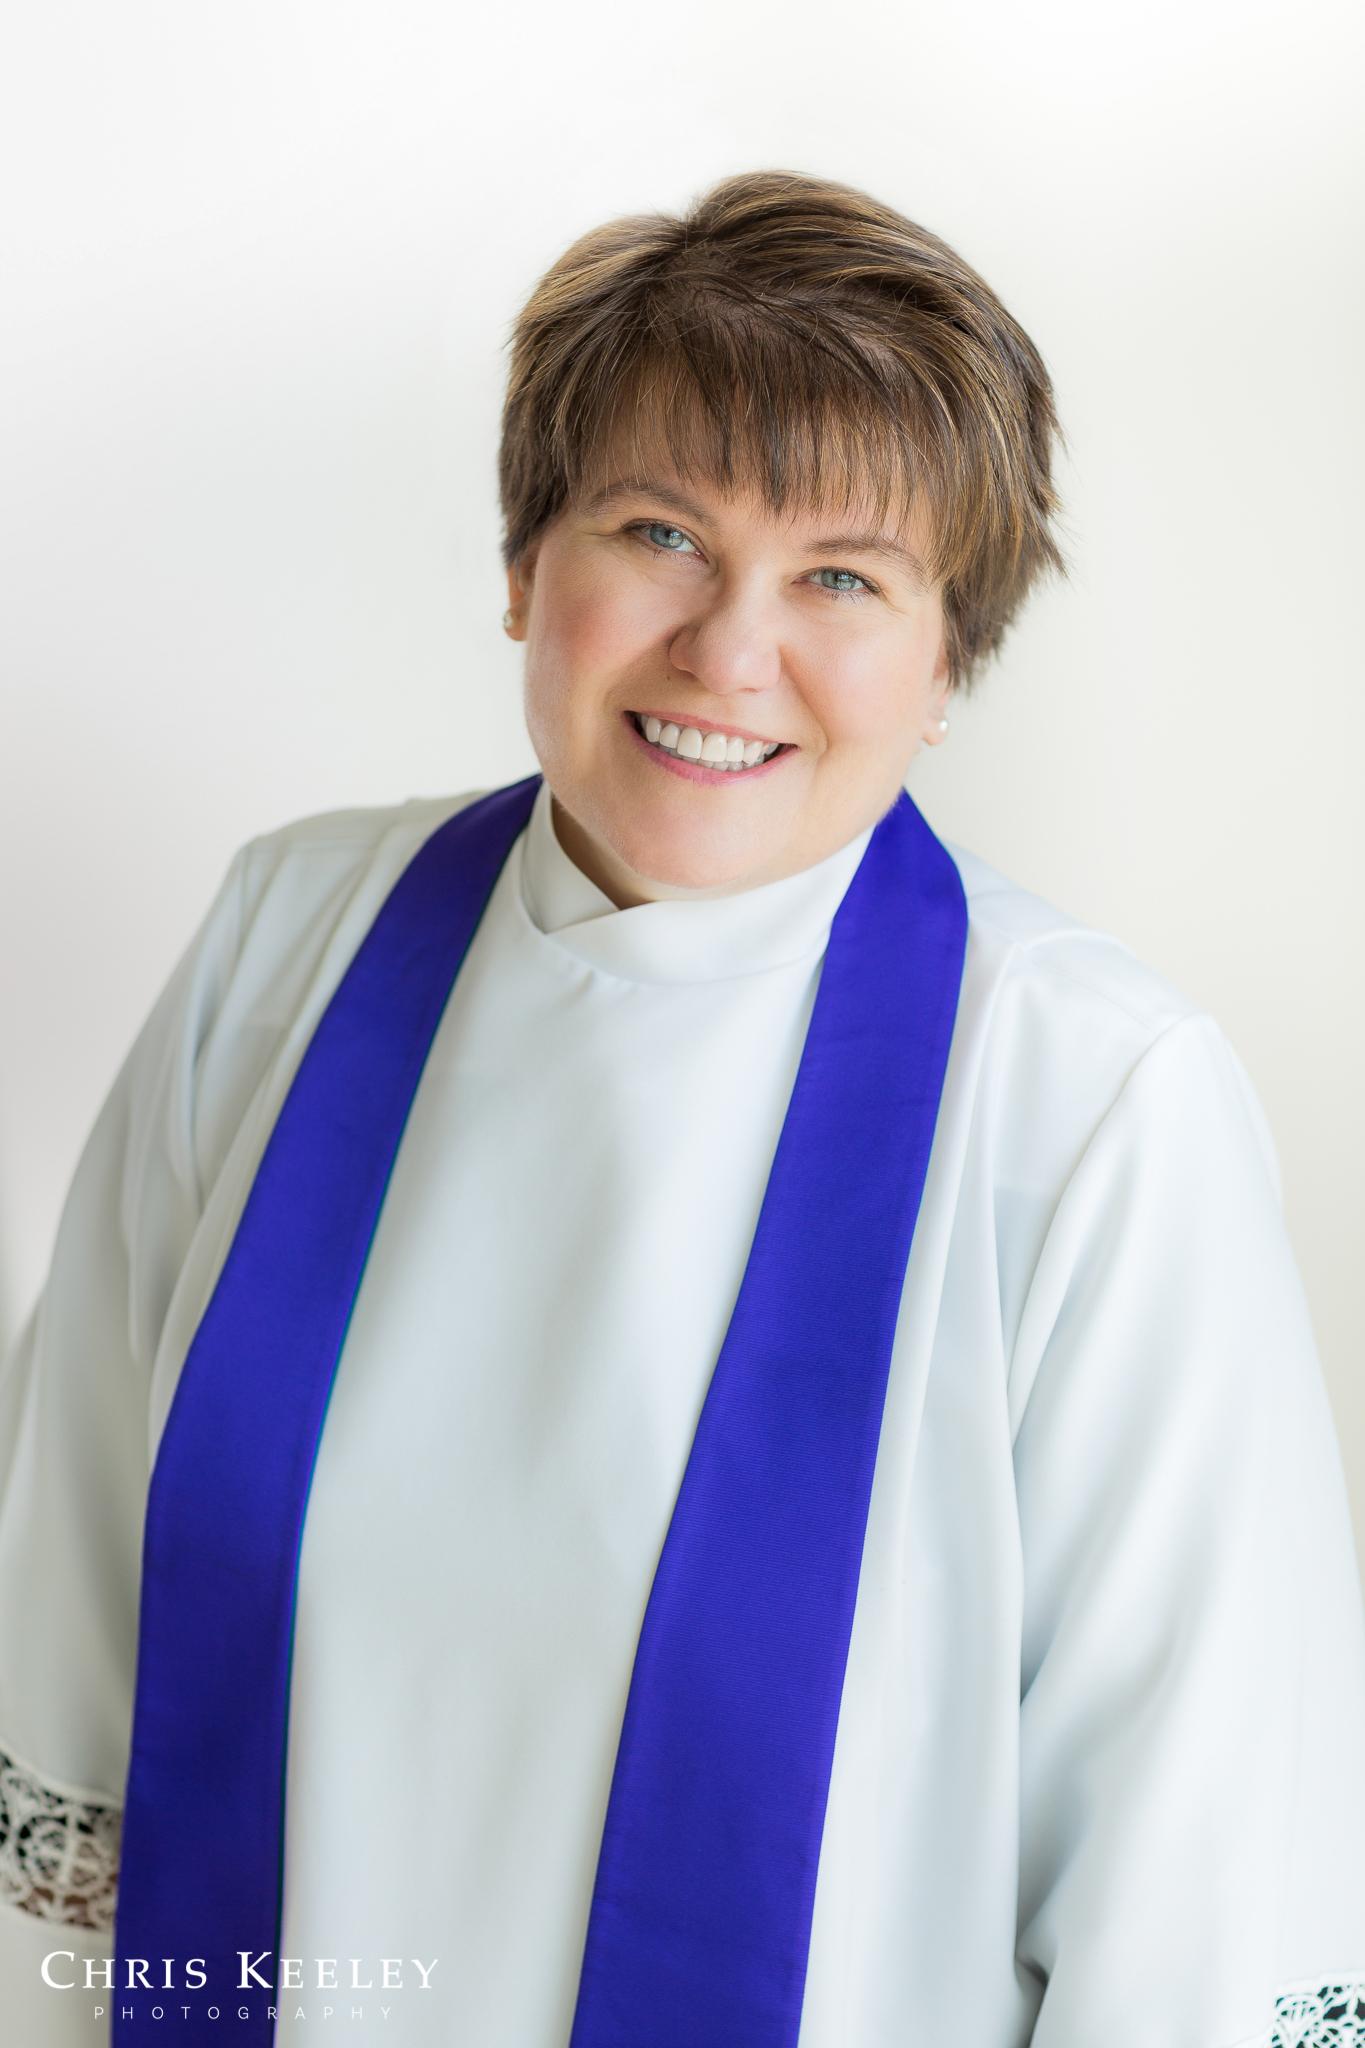 A chaplain headshot with a warm, glowing feel